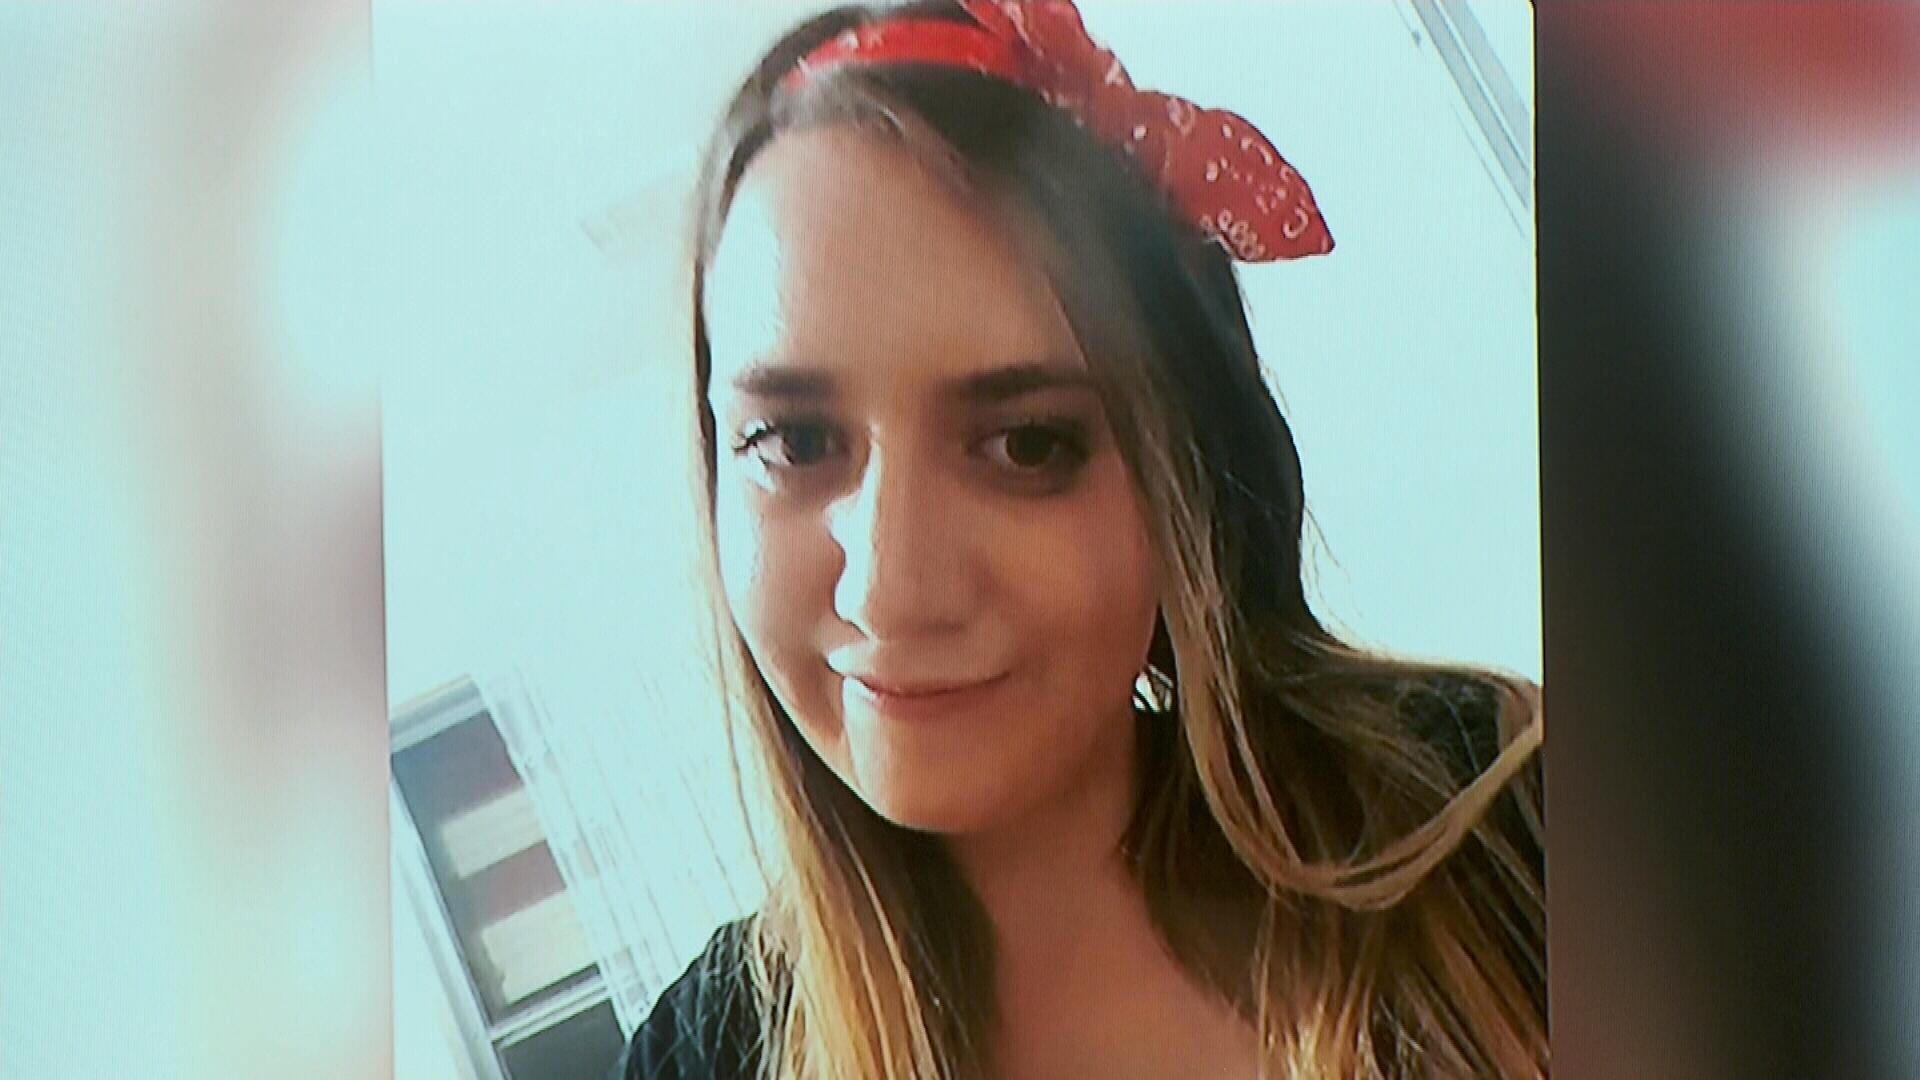 Body found in Melbourne park identified